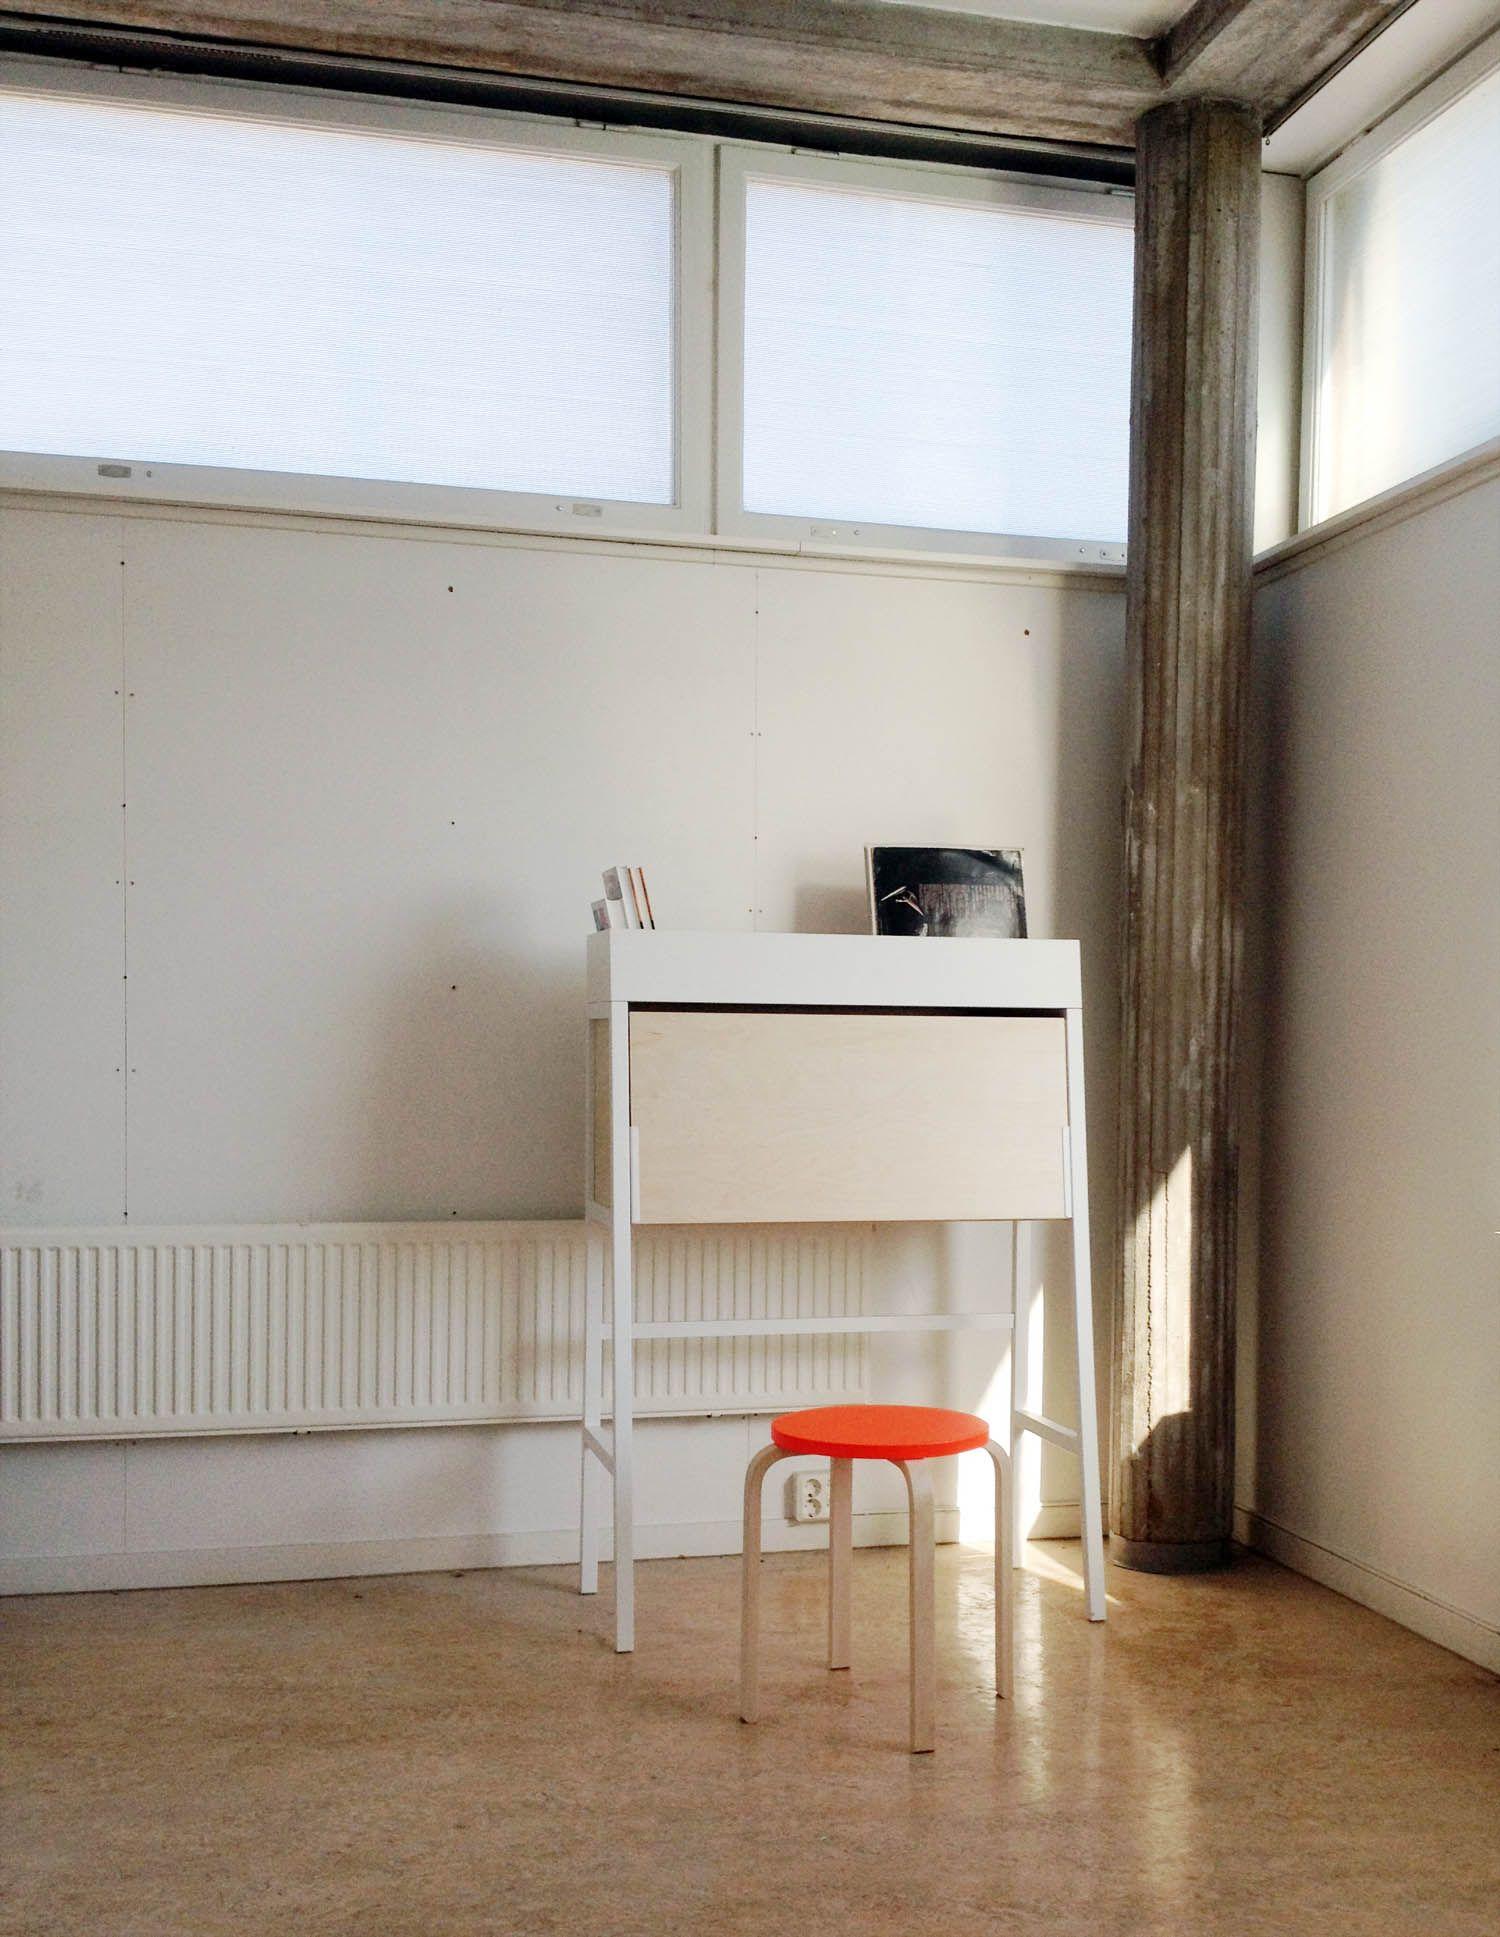 krystian kowalski industrial design bureau ikea ps collection 2014 ine pinterest bureau. Black Bedroom Furniture Sets. Home Design Ideas